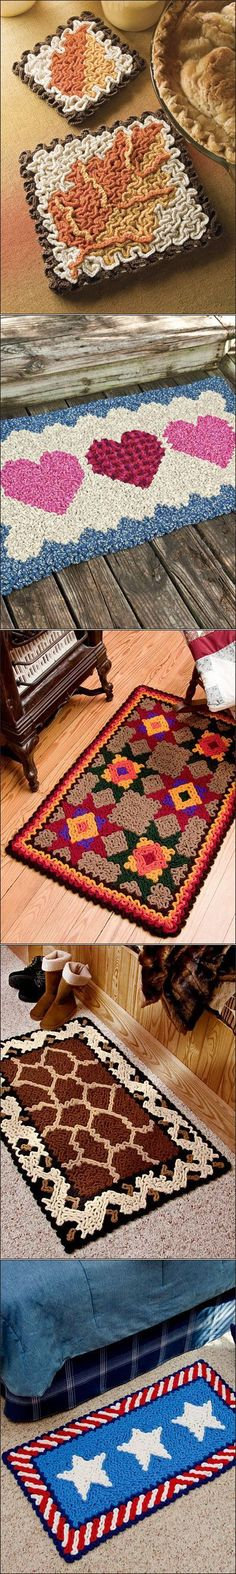 Vyazanie.Pledy, stoles, shawls | Entries in category Vyazanie.Pledy, stoles, shawls | blog Elefeni